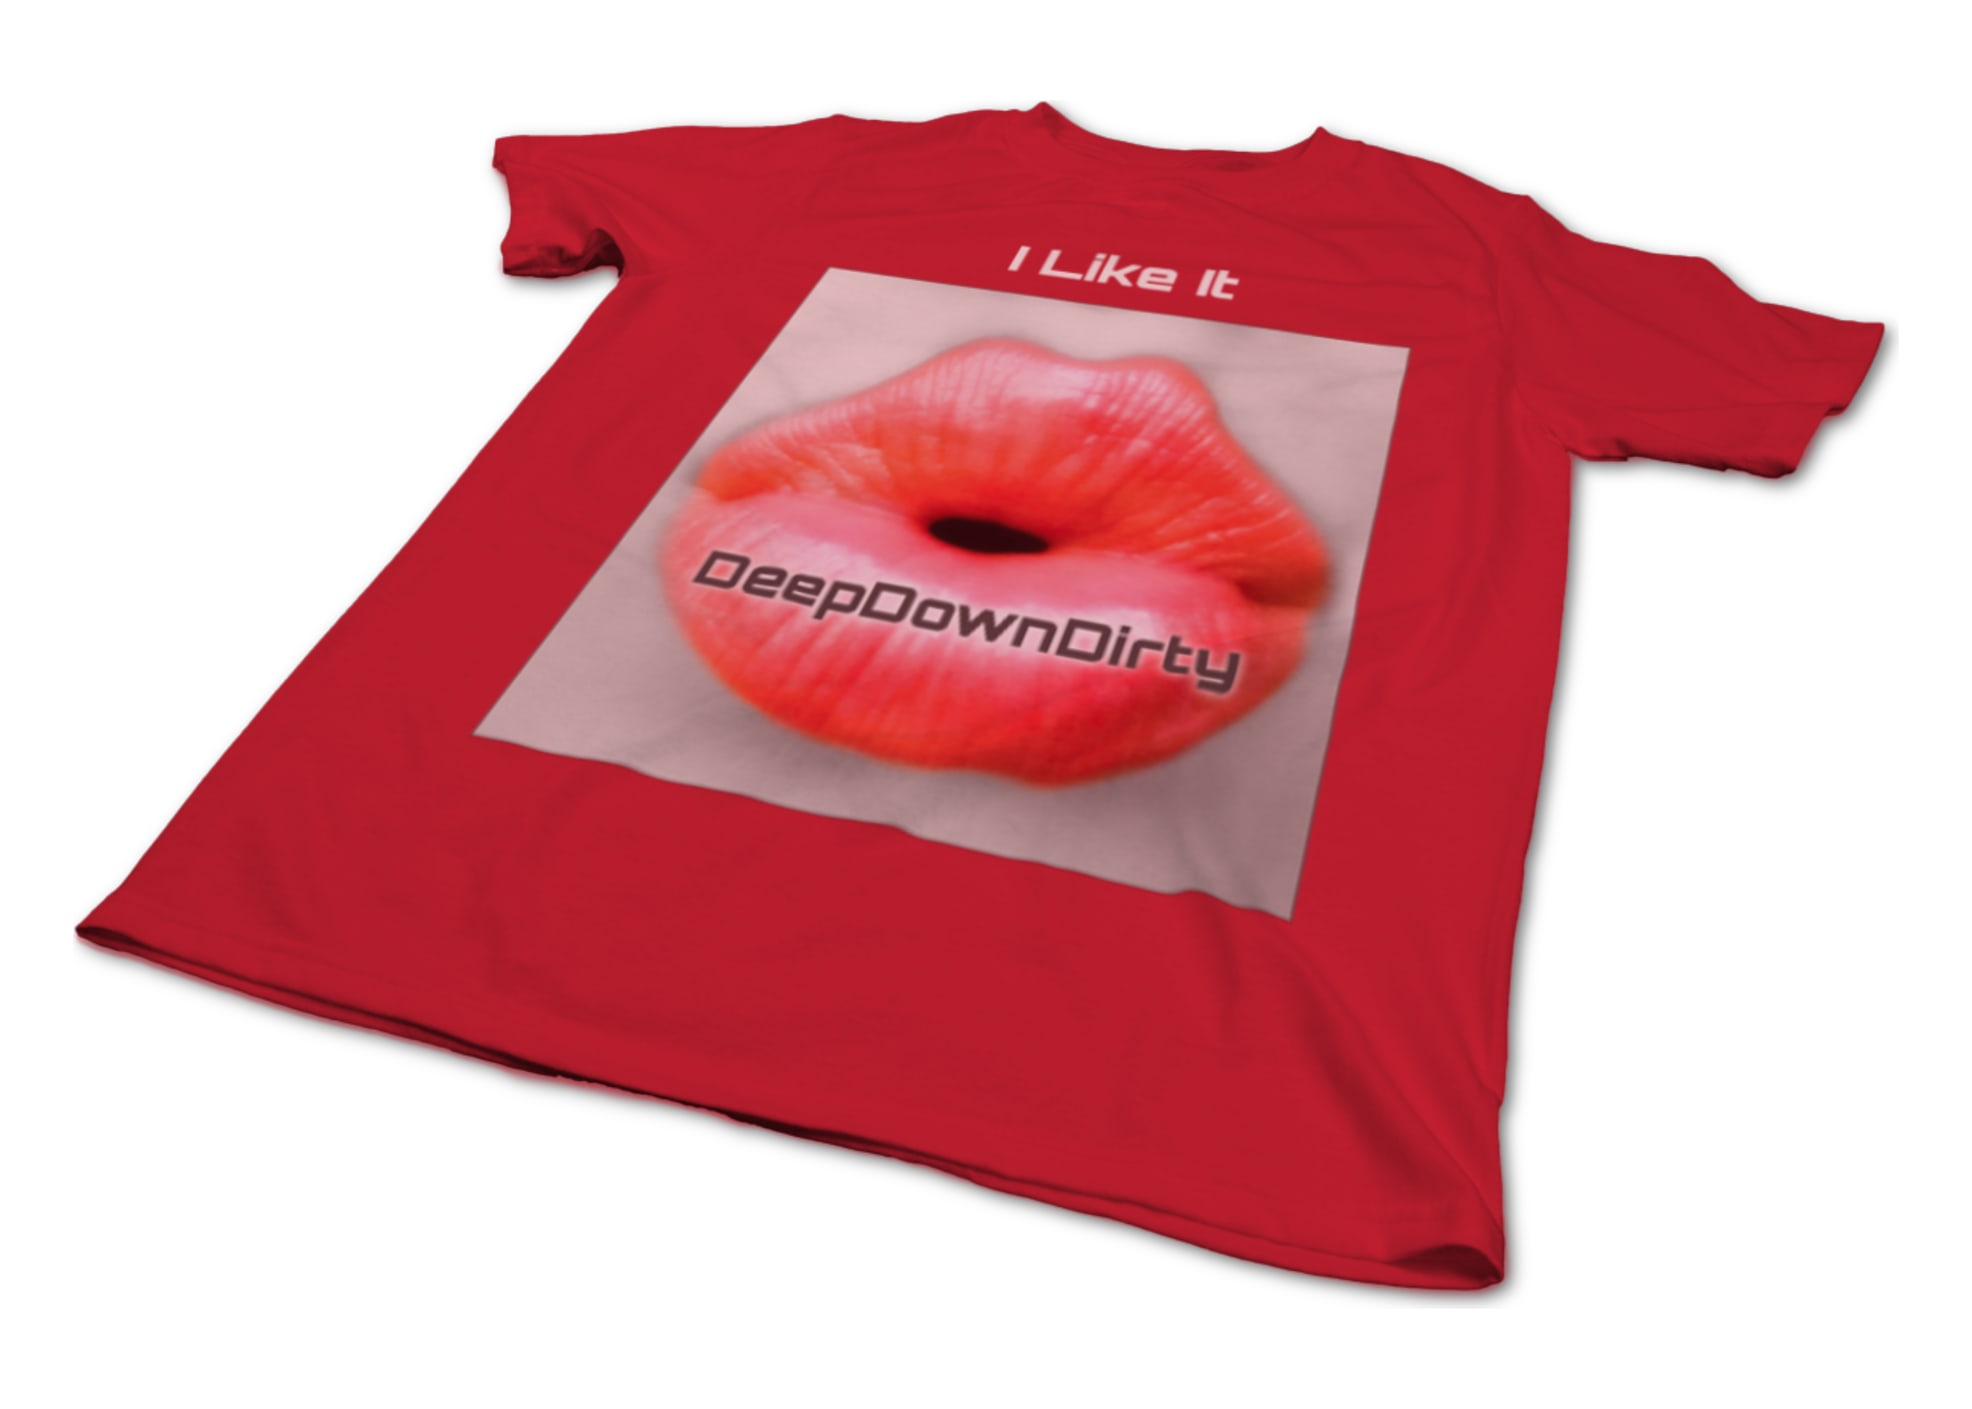 Deepdowndirty record label i like it square 1495838225